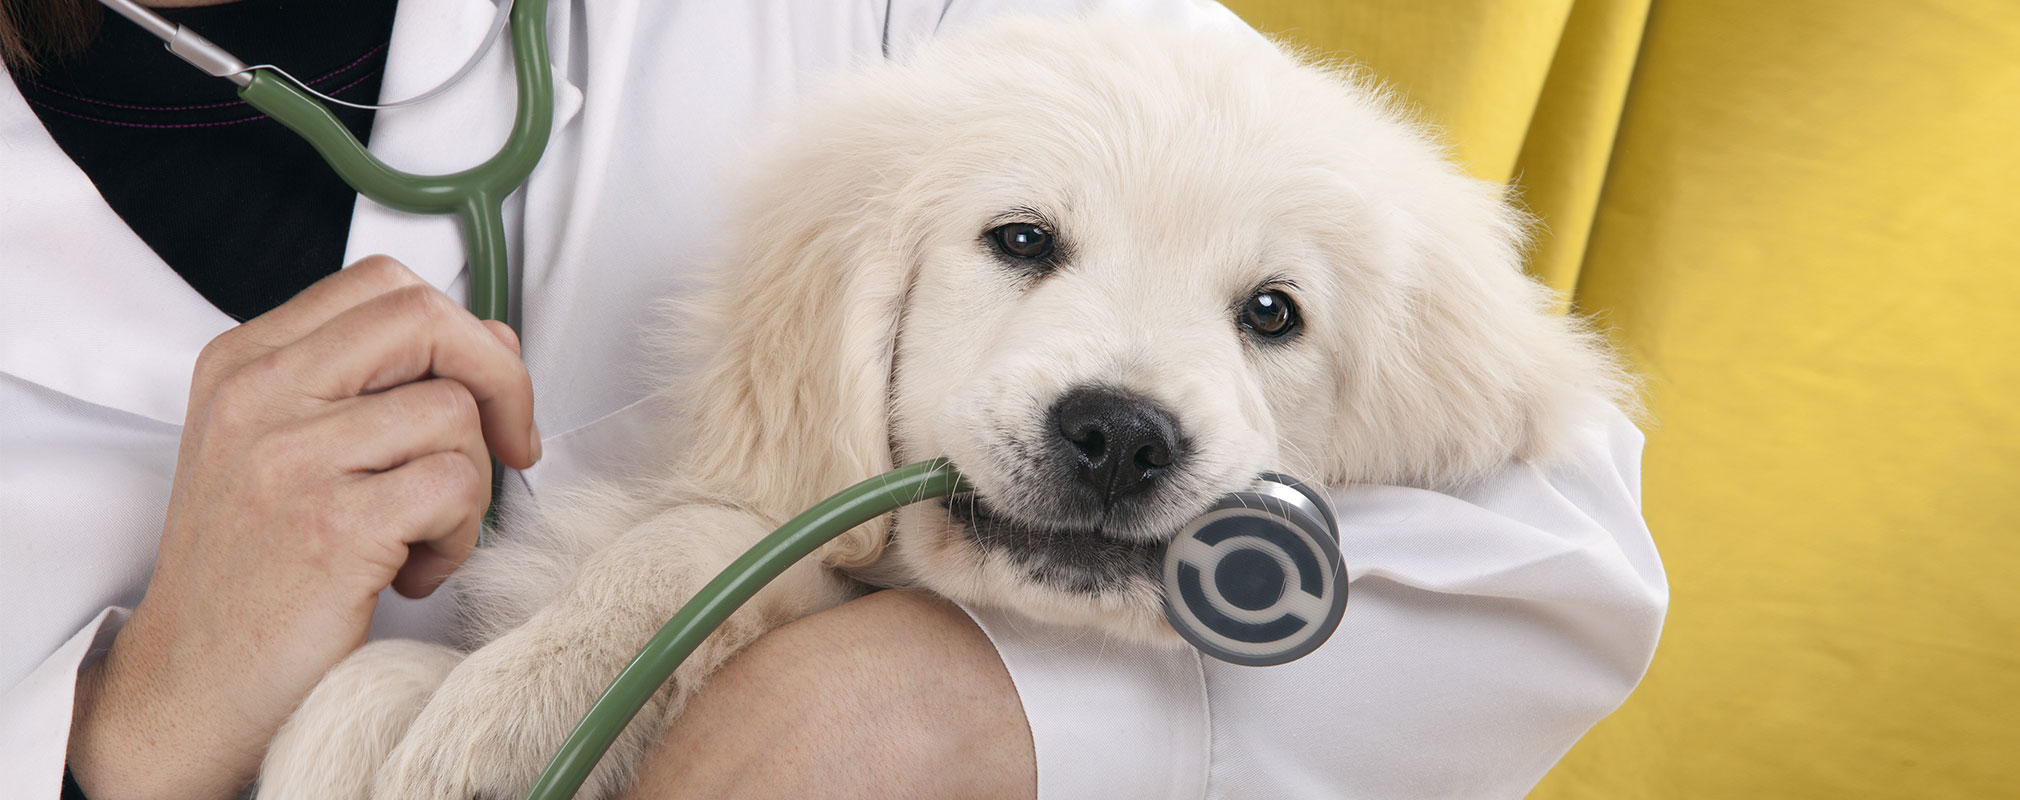 Need A Puppy Vaccination In Orlando